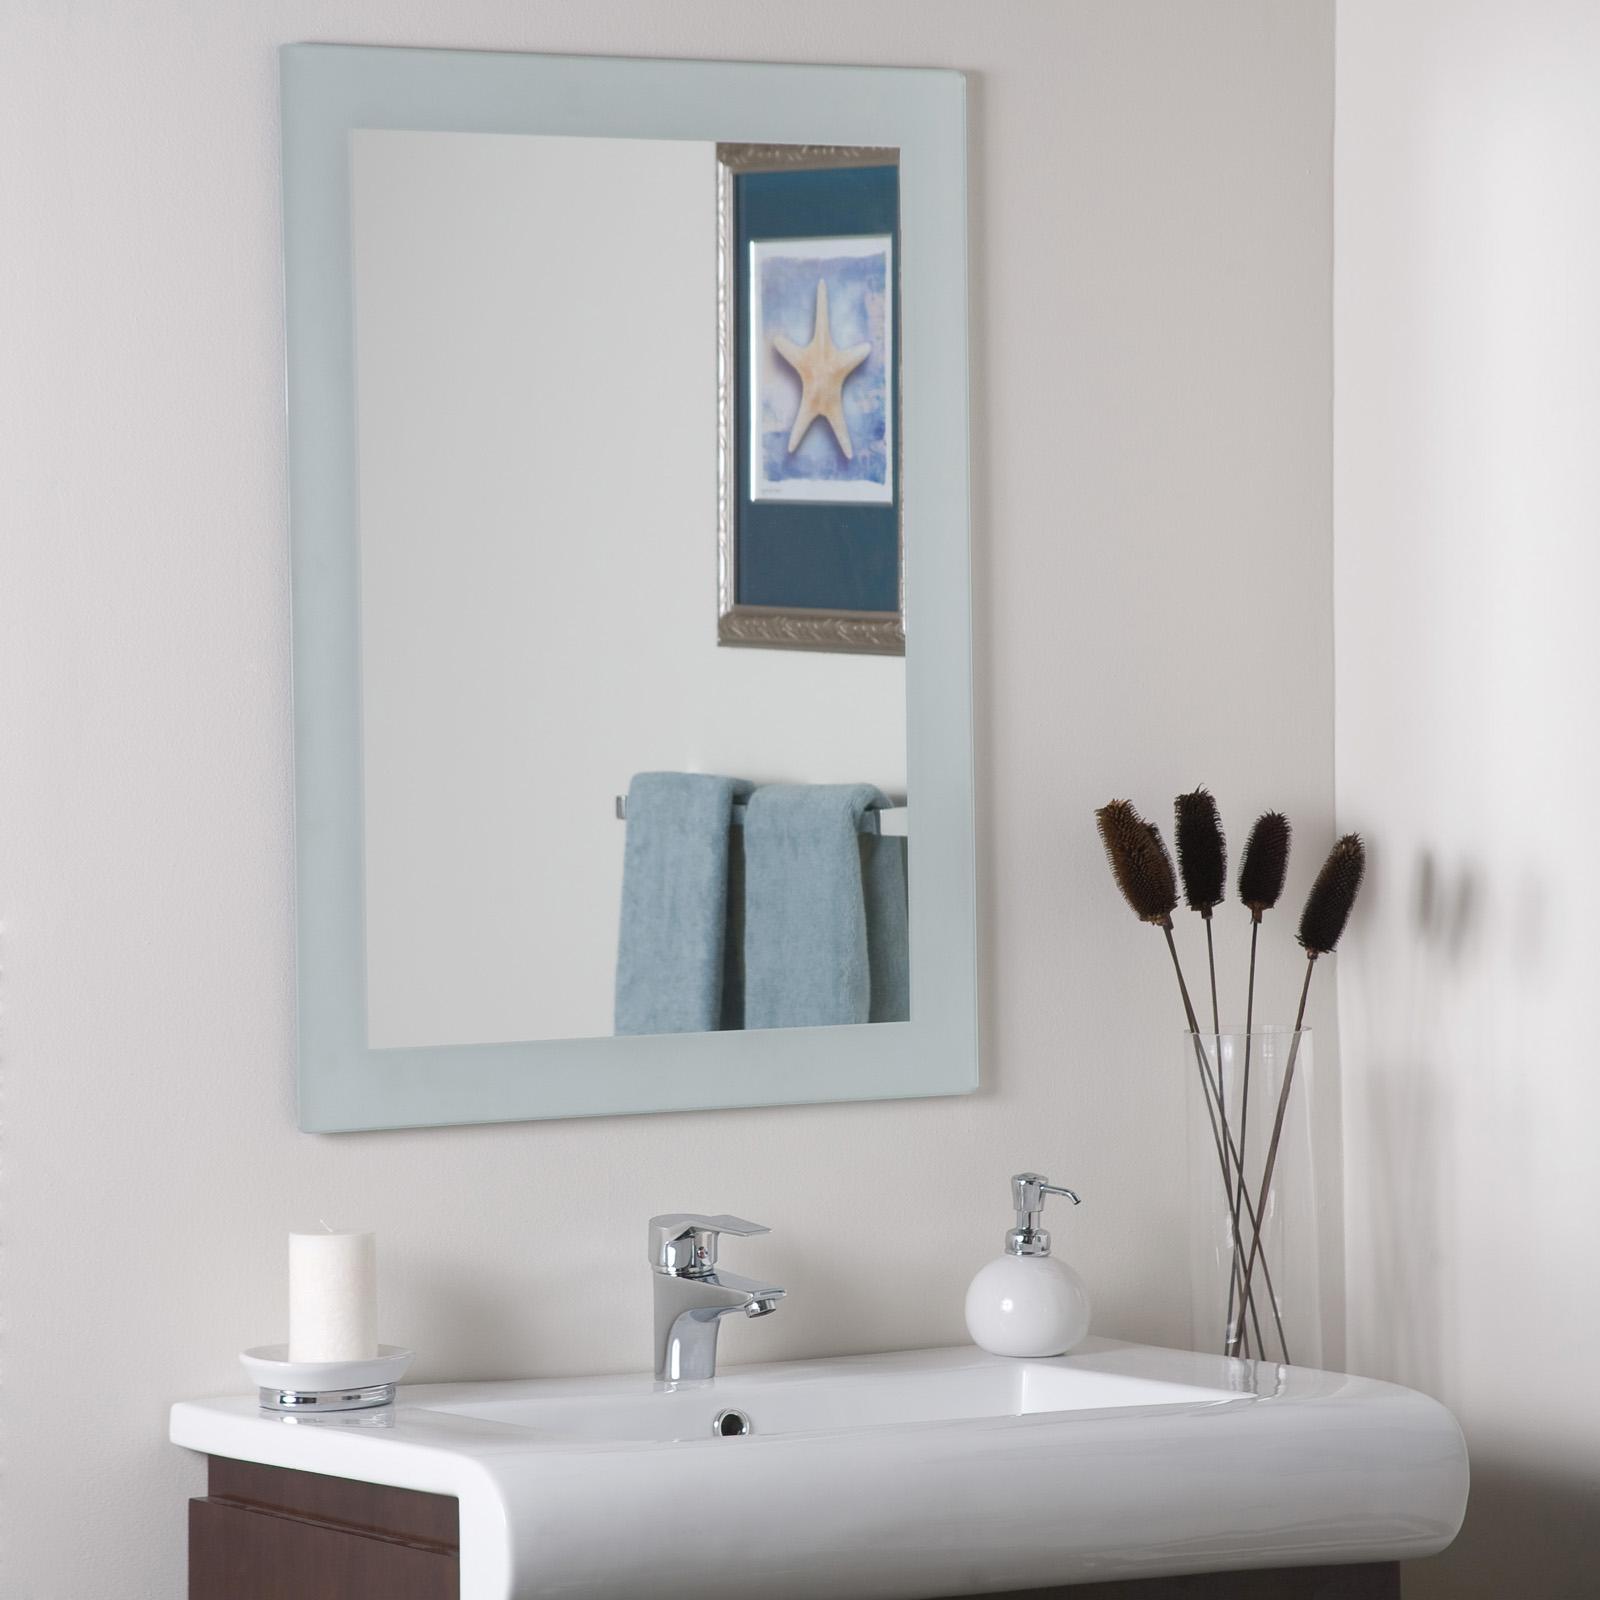 sandblasted border wall mirror in frameless mirrors. Black Bedroom Furniture Sets. Home Design Ideas